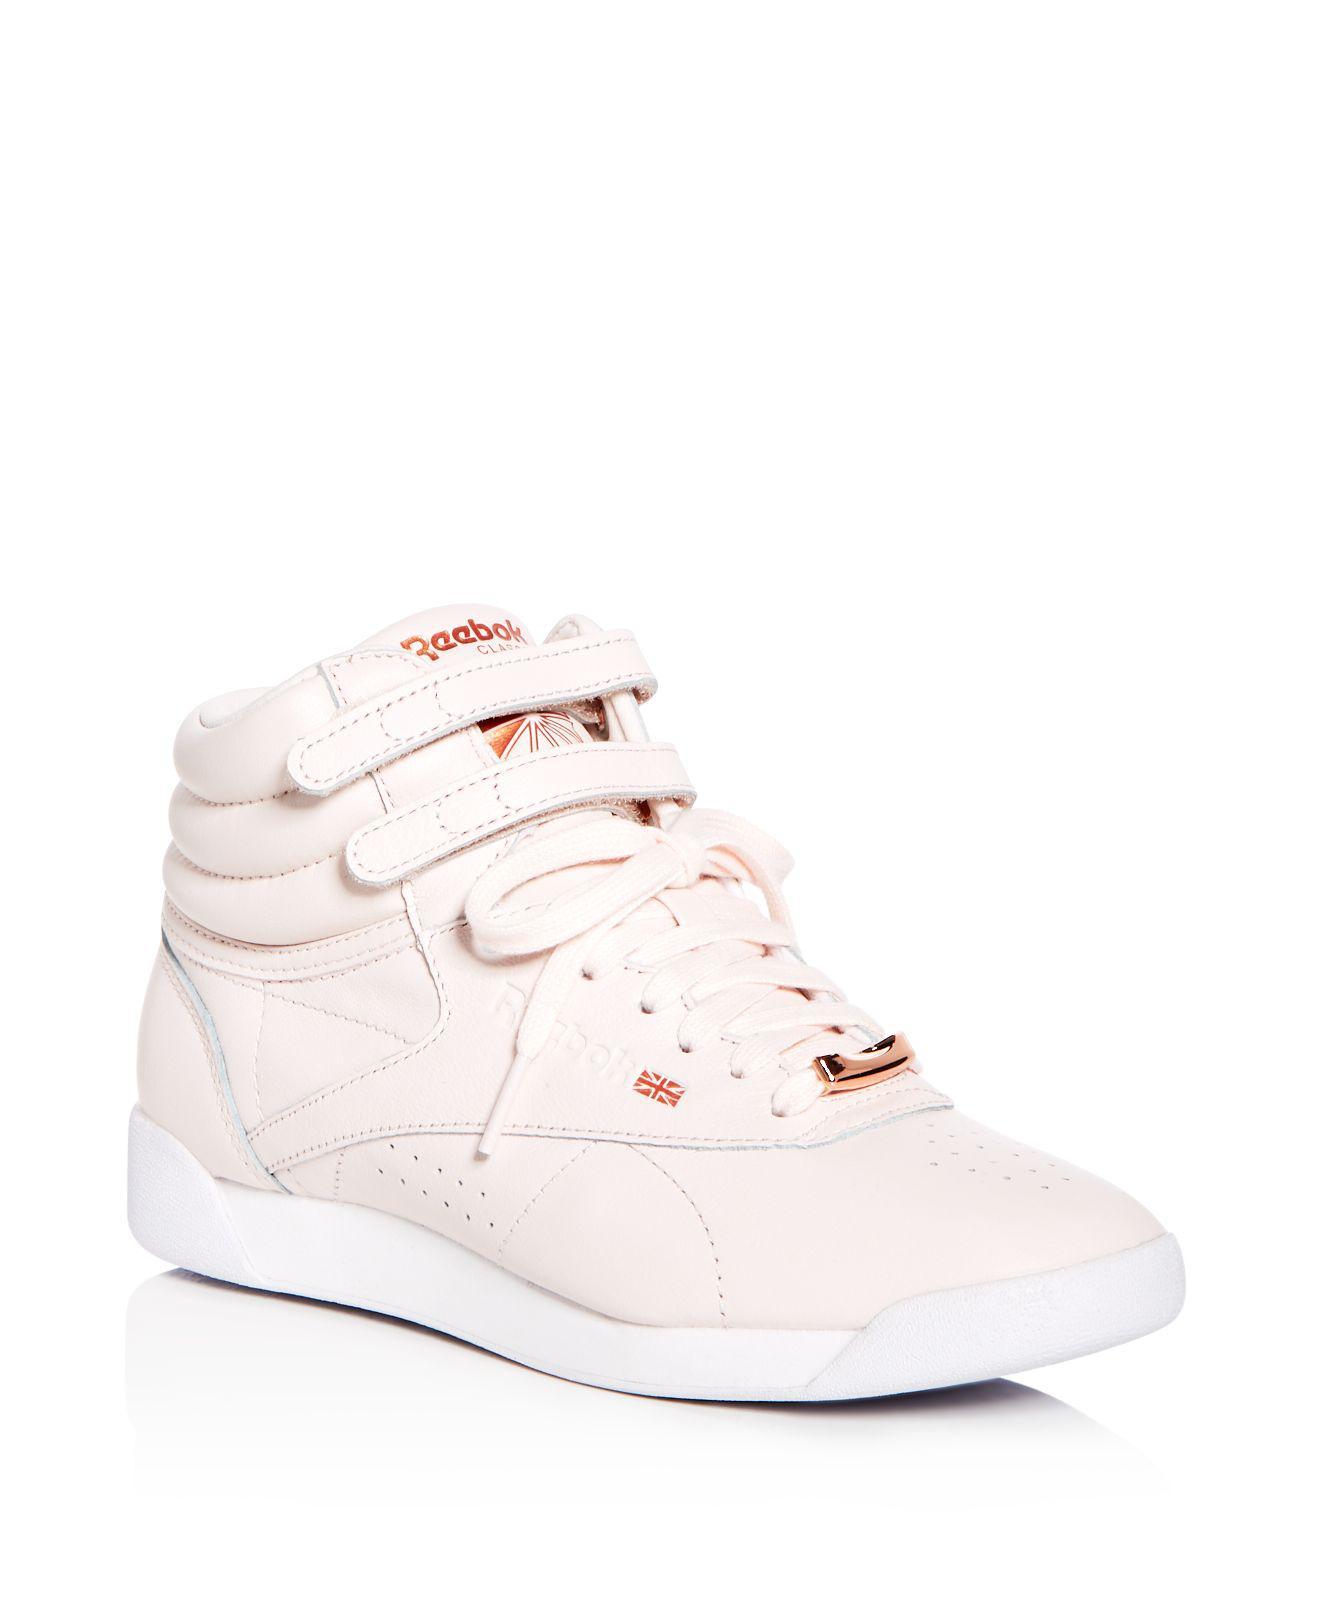 Reebok Women's Freestyle Hi Leather High Top Sneakers 61YztPjWS